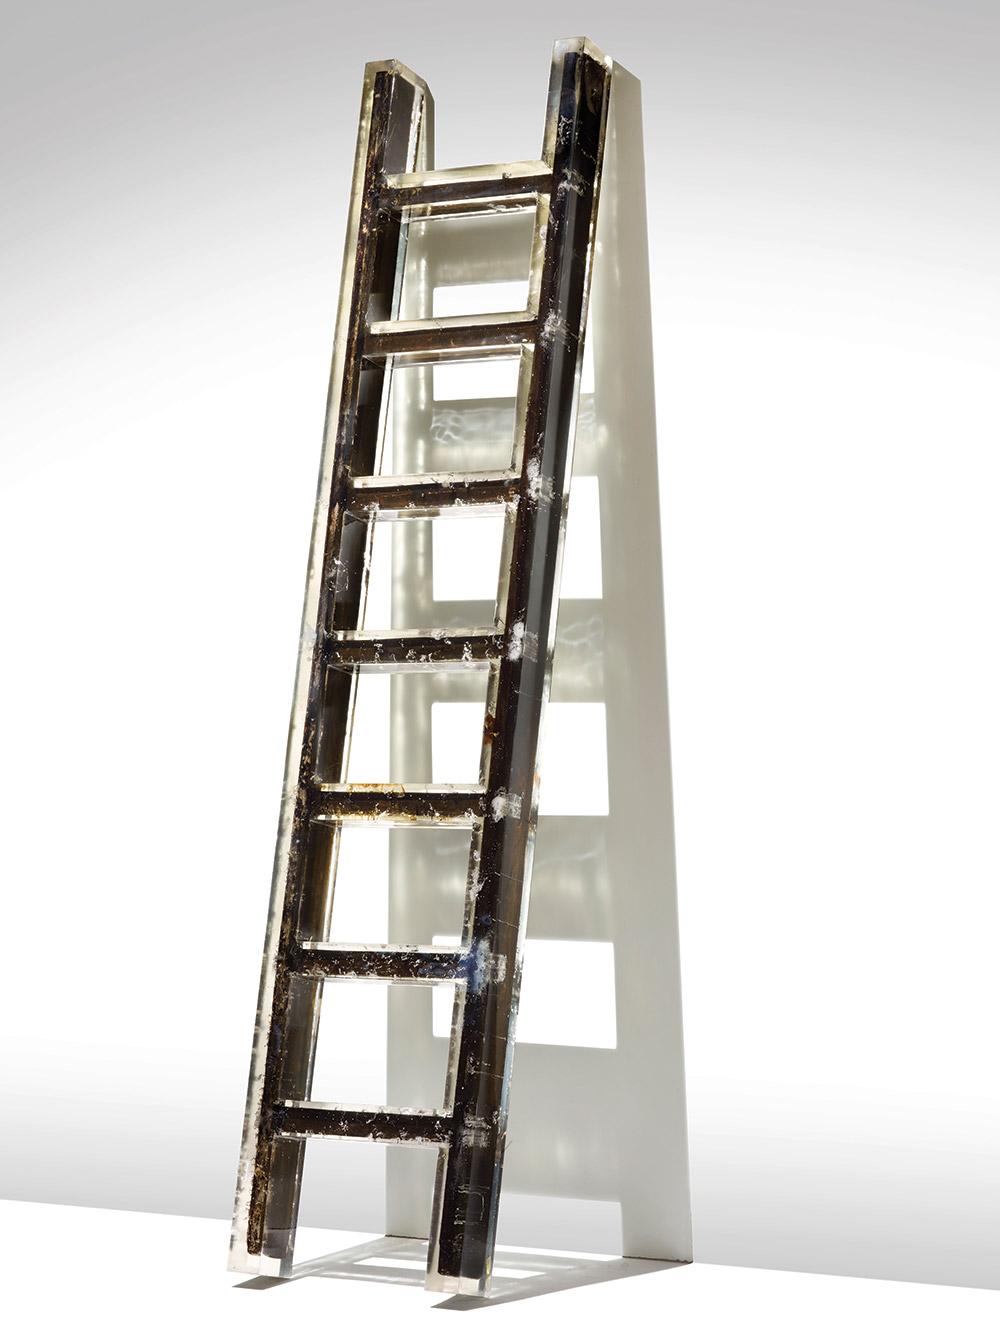 Studio_Nucleo_Souvenir-of-the-last-century_Ladder_low